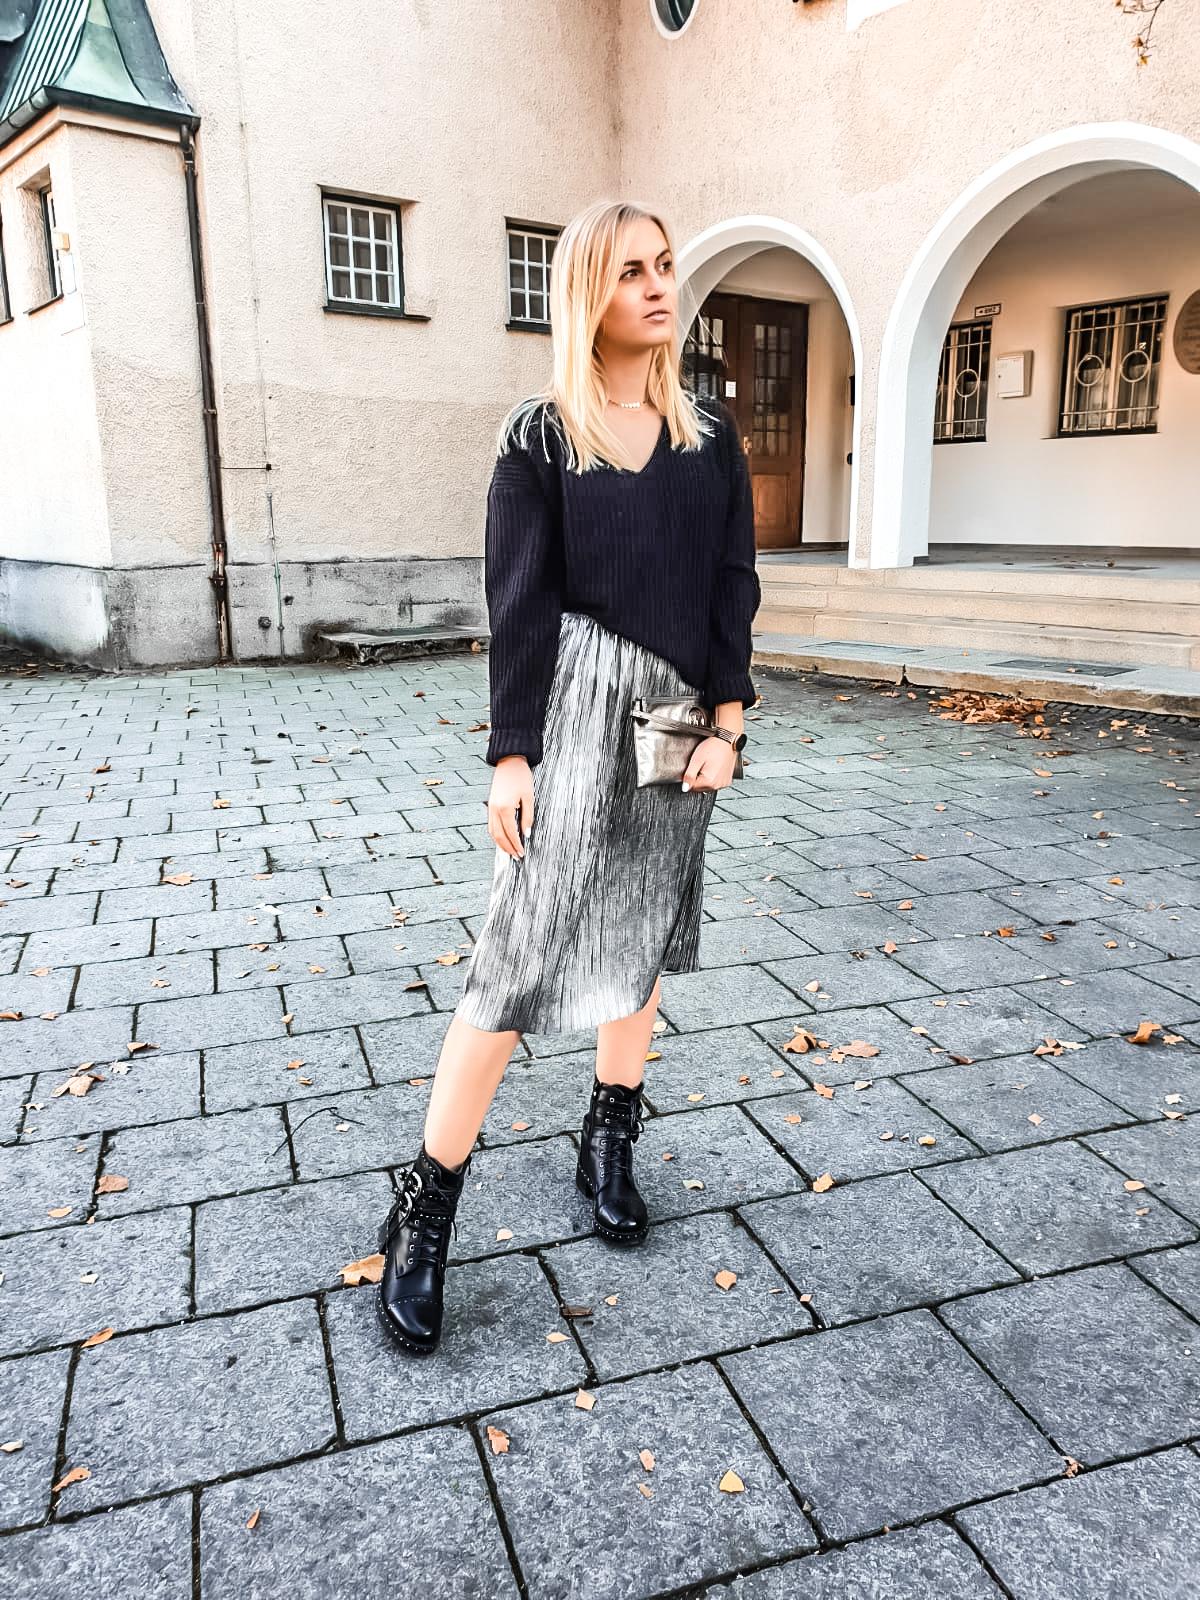 Metallic, Outfit, Katefully, München, Rock silber, Fashionblog, Modeblog, Munich, ootd, Metallic Look, silber gold bronze, Wintermode, Herbst, Christmas, Weihnachten